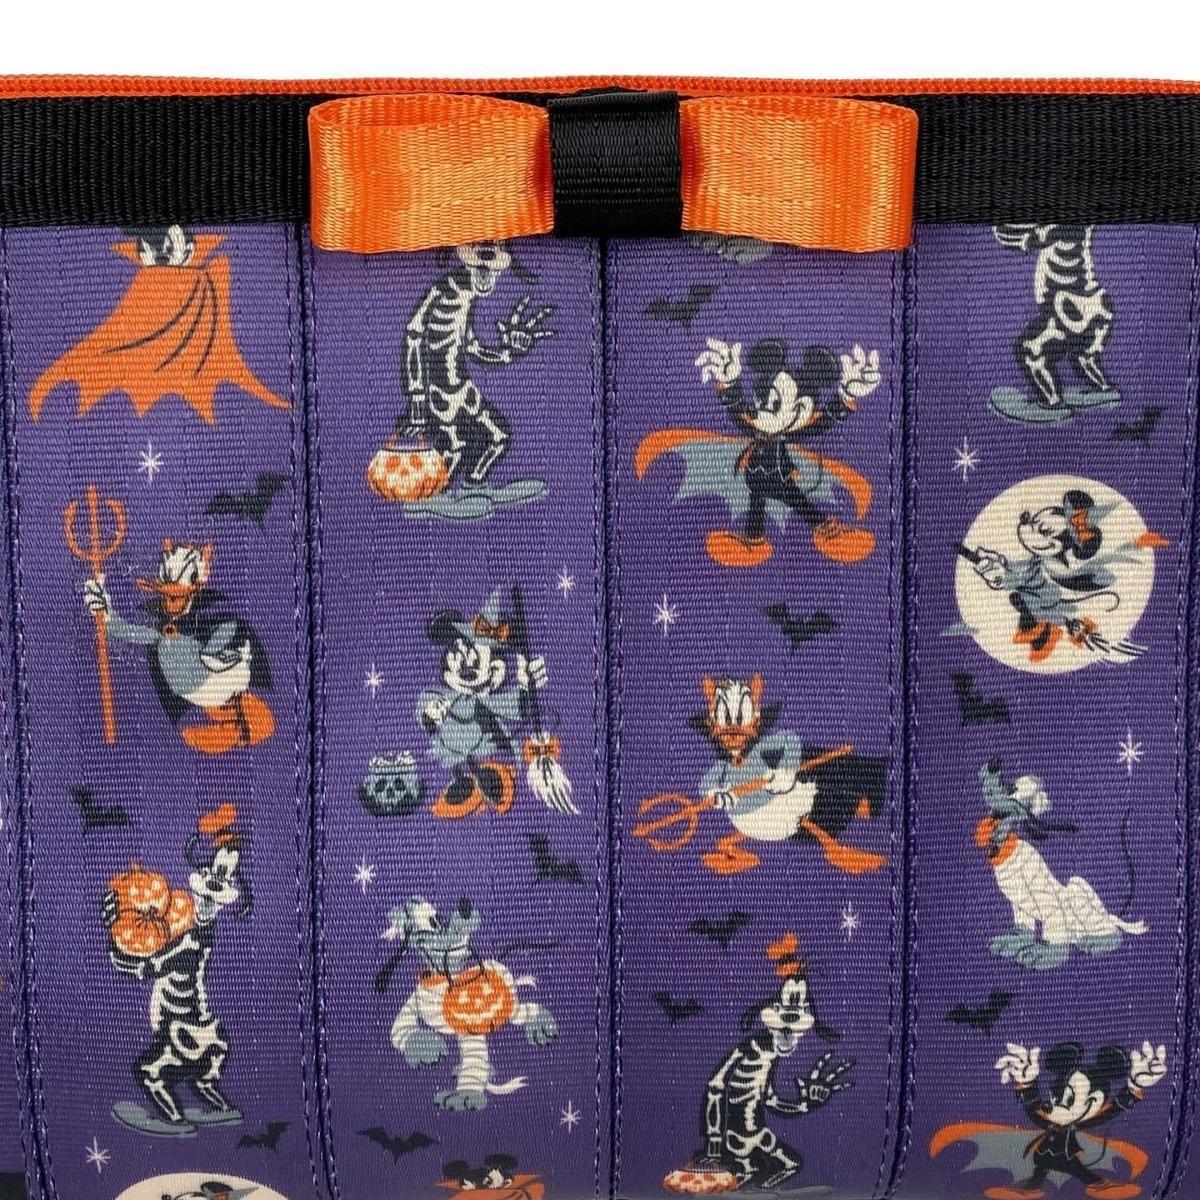 New Disney Halloween Line from Harveys! 3